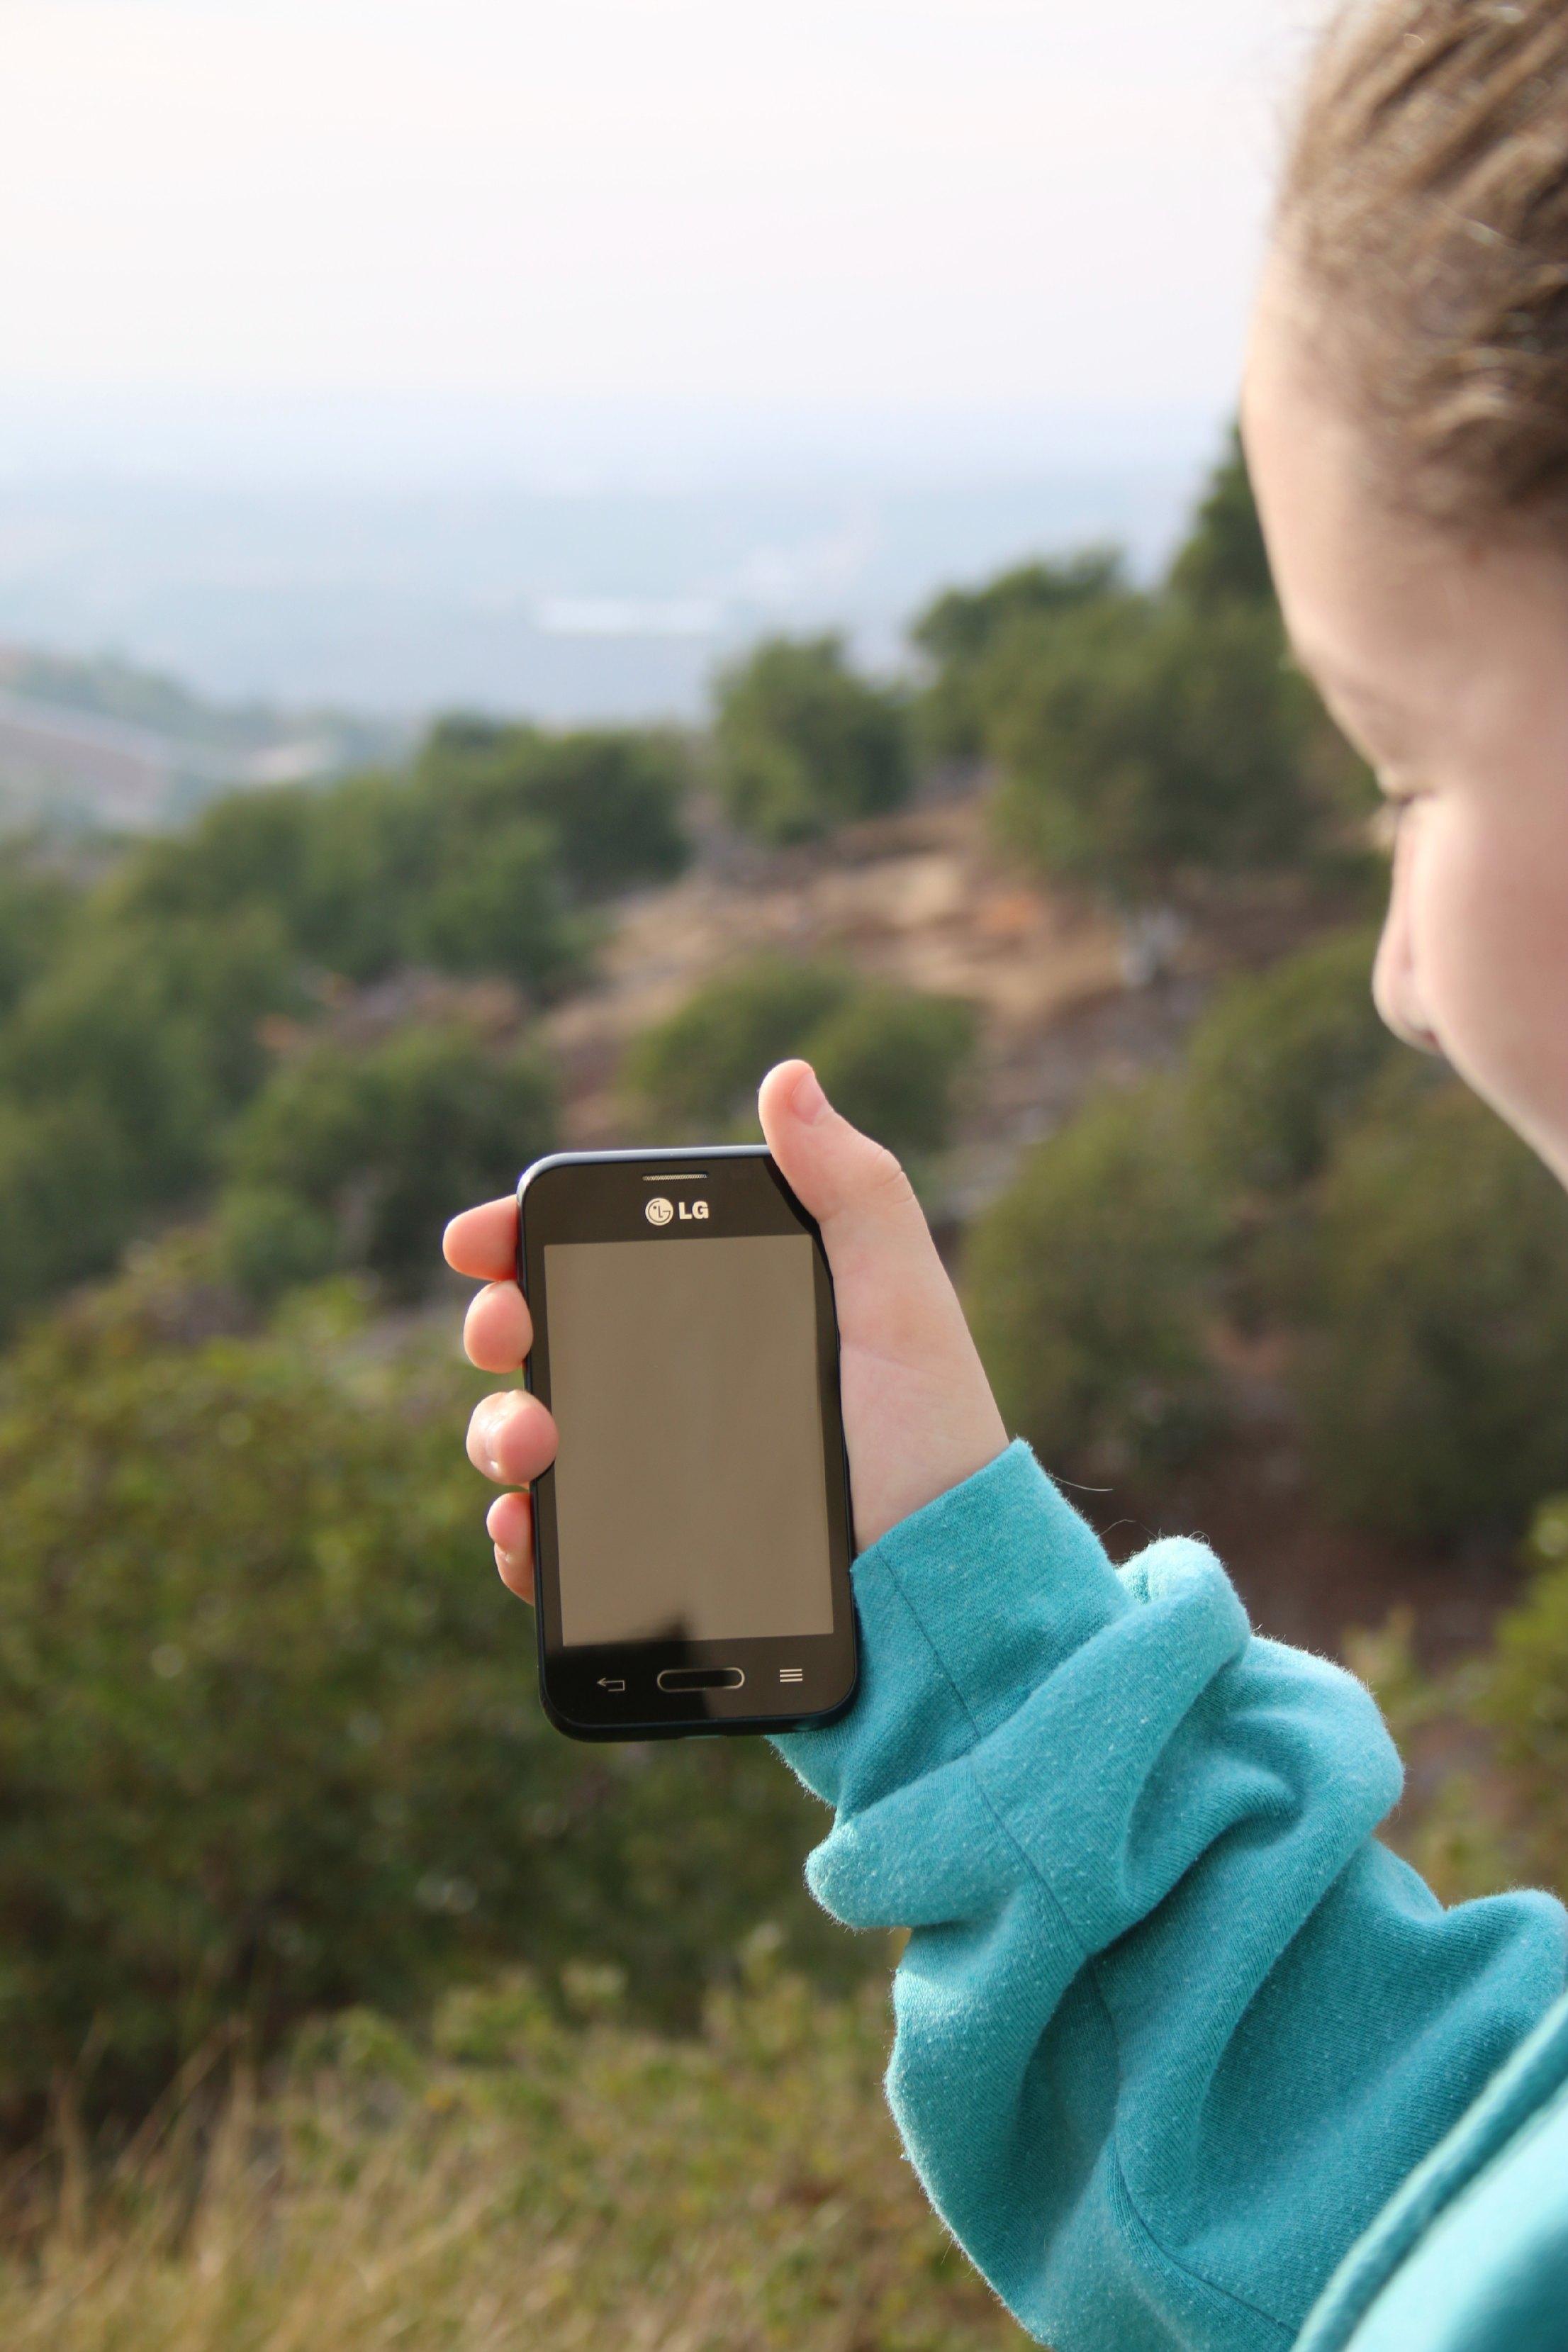 LG Spongebob squarepants phone